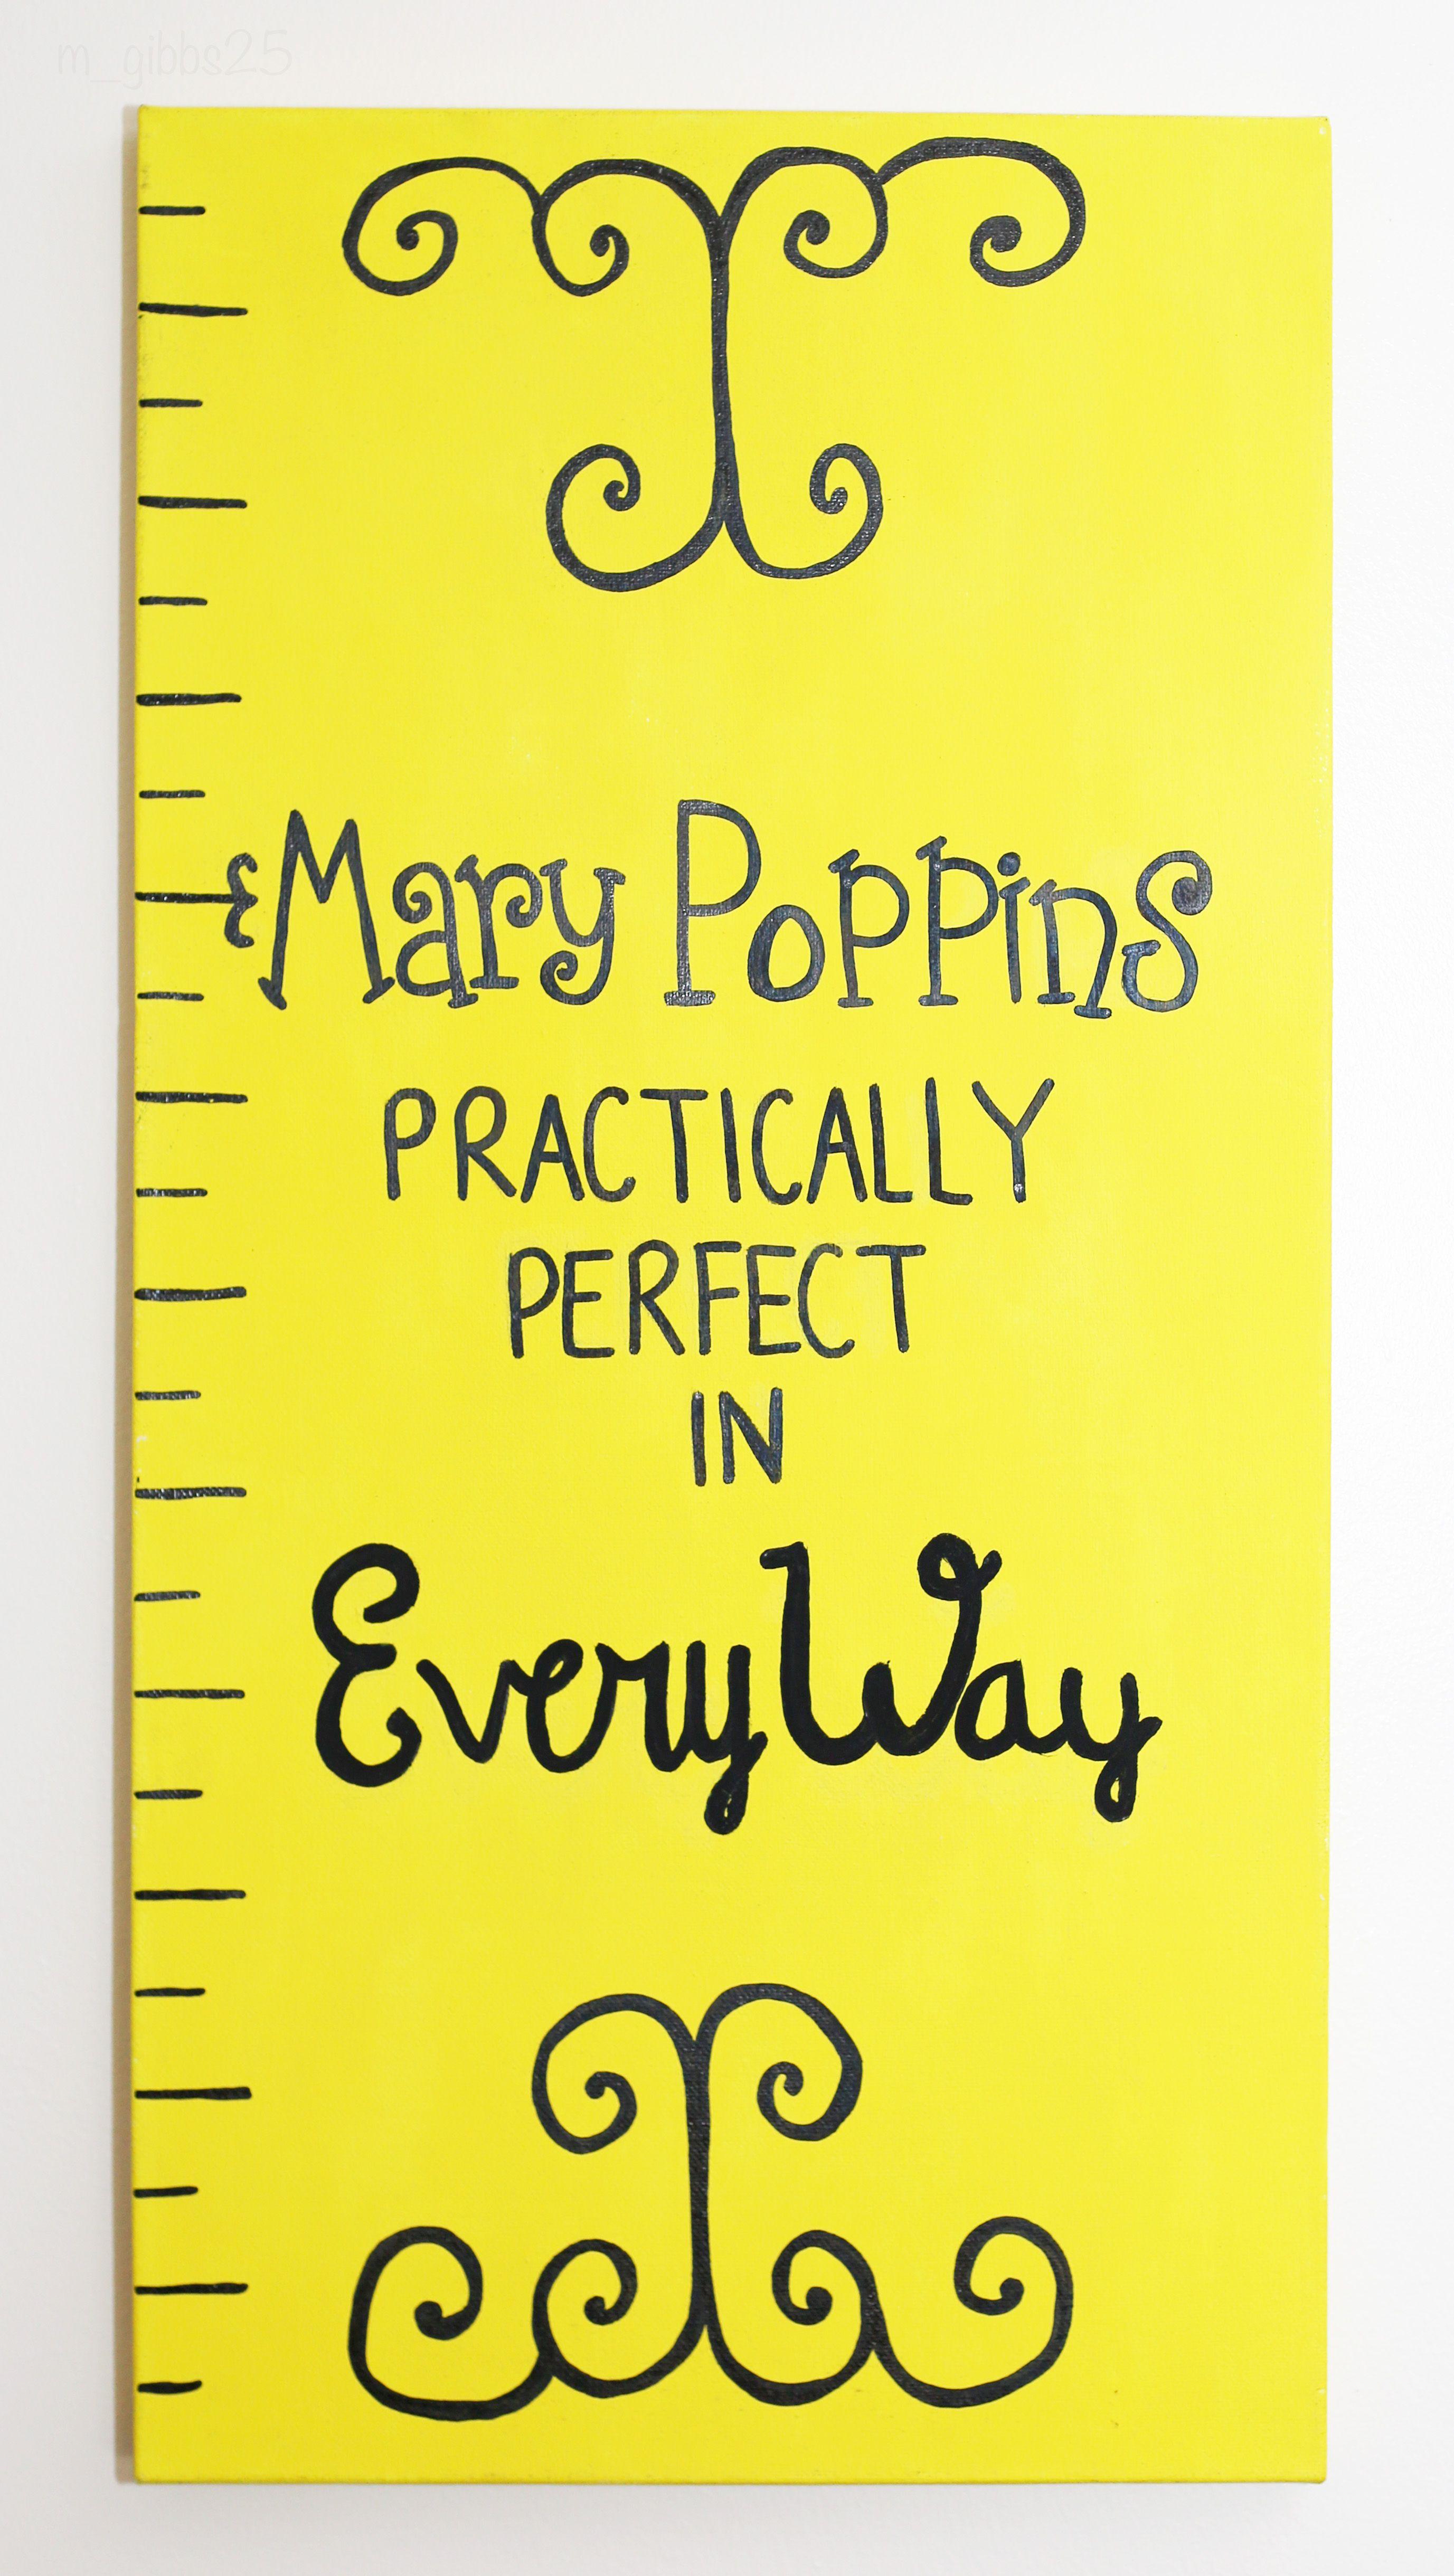 Mary Poppins Wall Decor - Acrylic Paint - Mary Poppins Practically ...